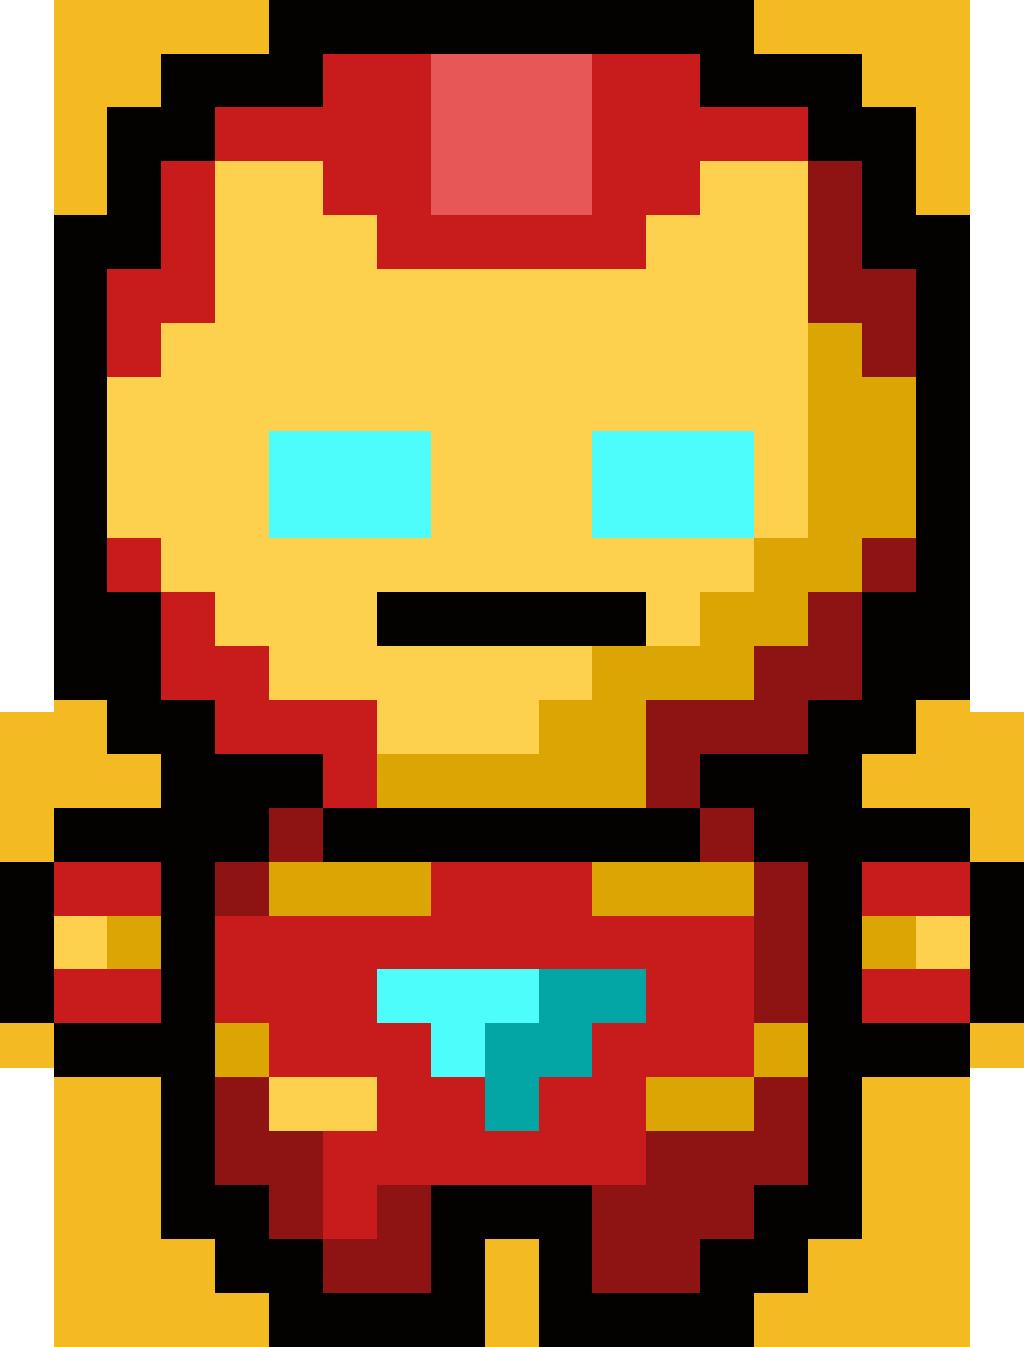 Image Result For Pixel Art Superheroes